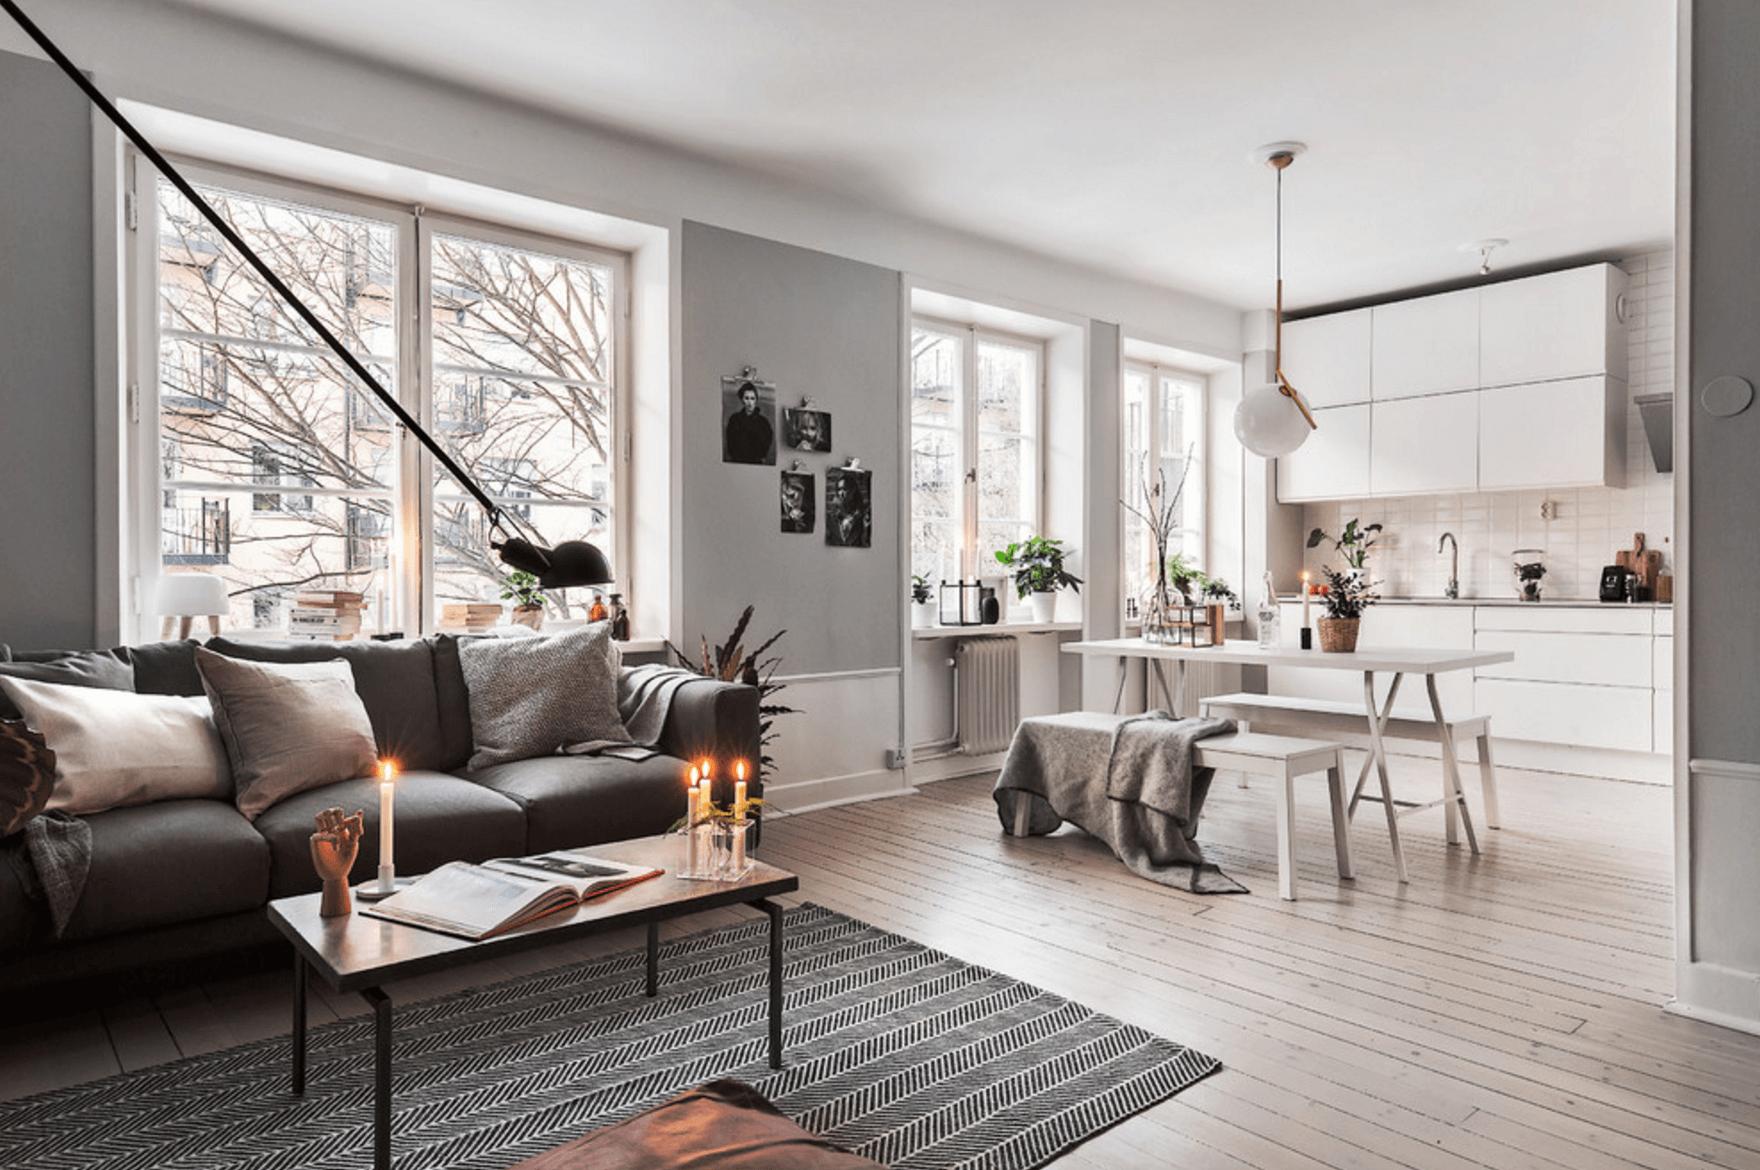 8 Ways To Style Scandinavian Interior Design At Home Modern Scandinavian Interior Scandinavian Interior Design Apartment Interior Design